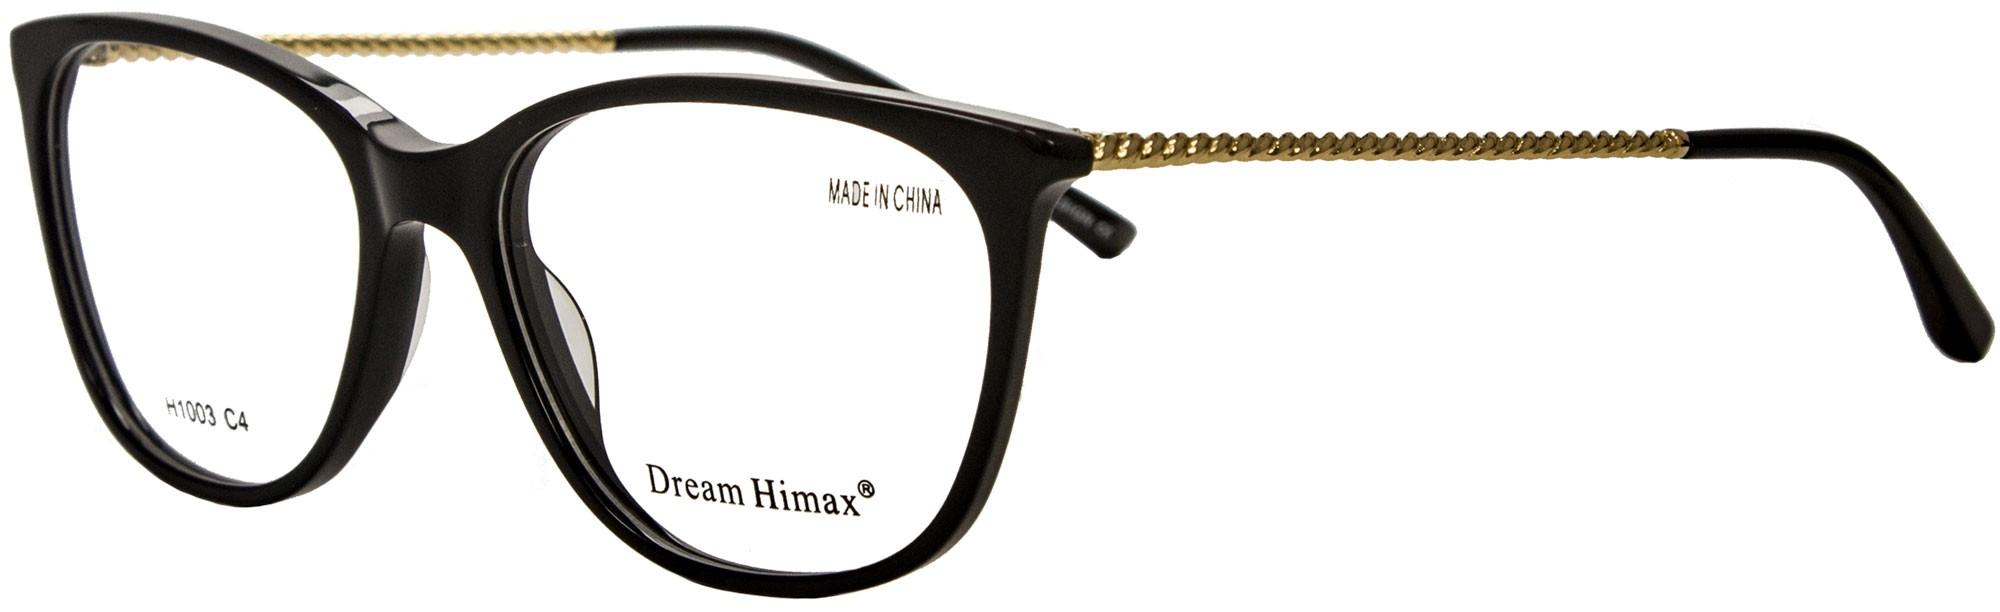 Dream Himax H1003 C4 2